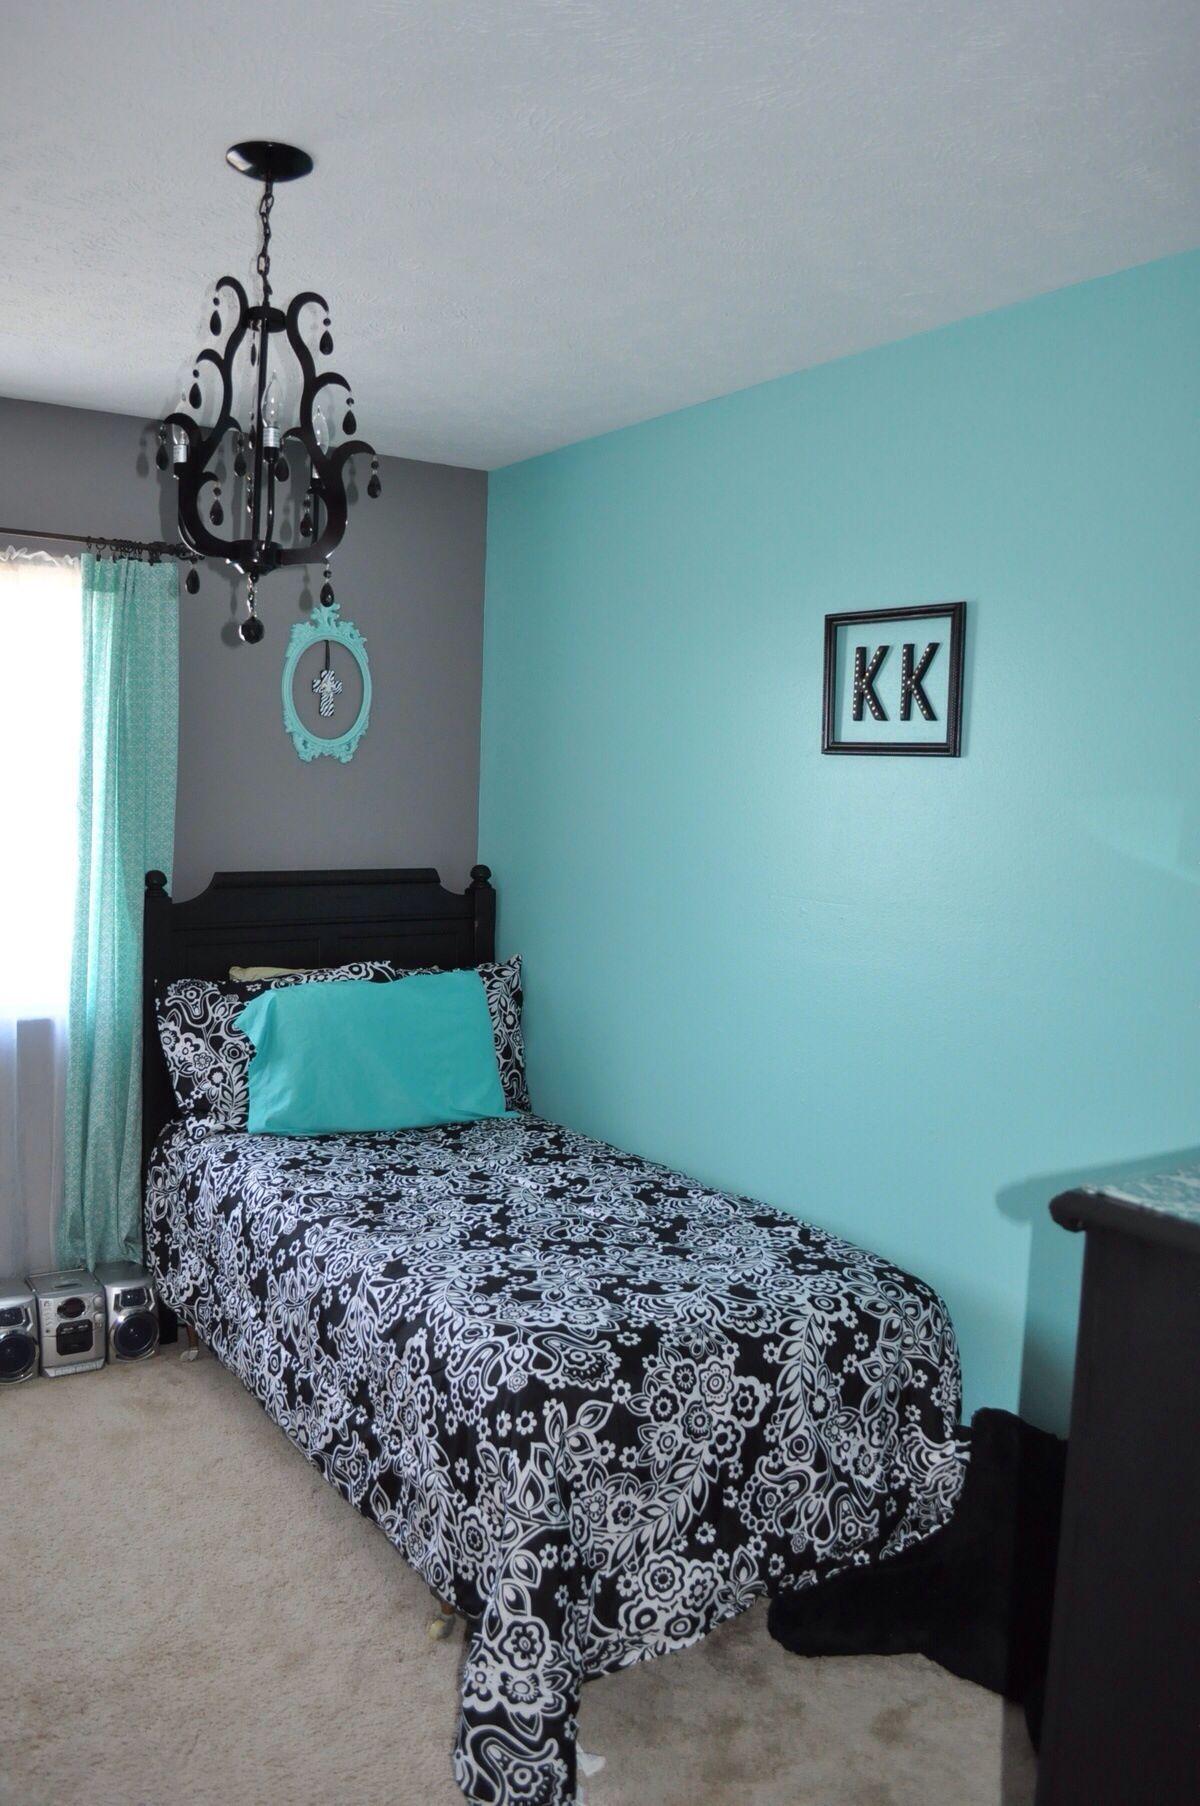 70 prettiest bedroom paint ideas for better sleep with on better quality sleep with better bedroom decorations id=38458